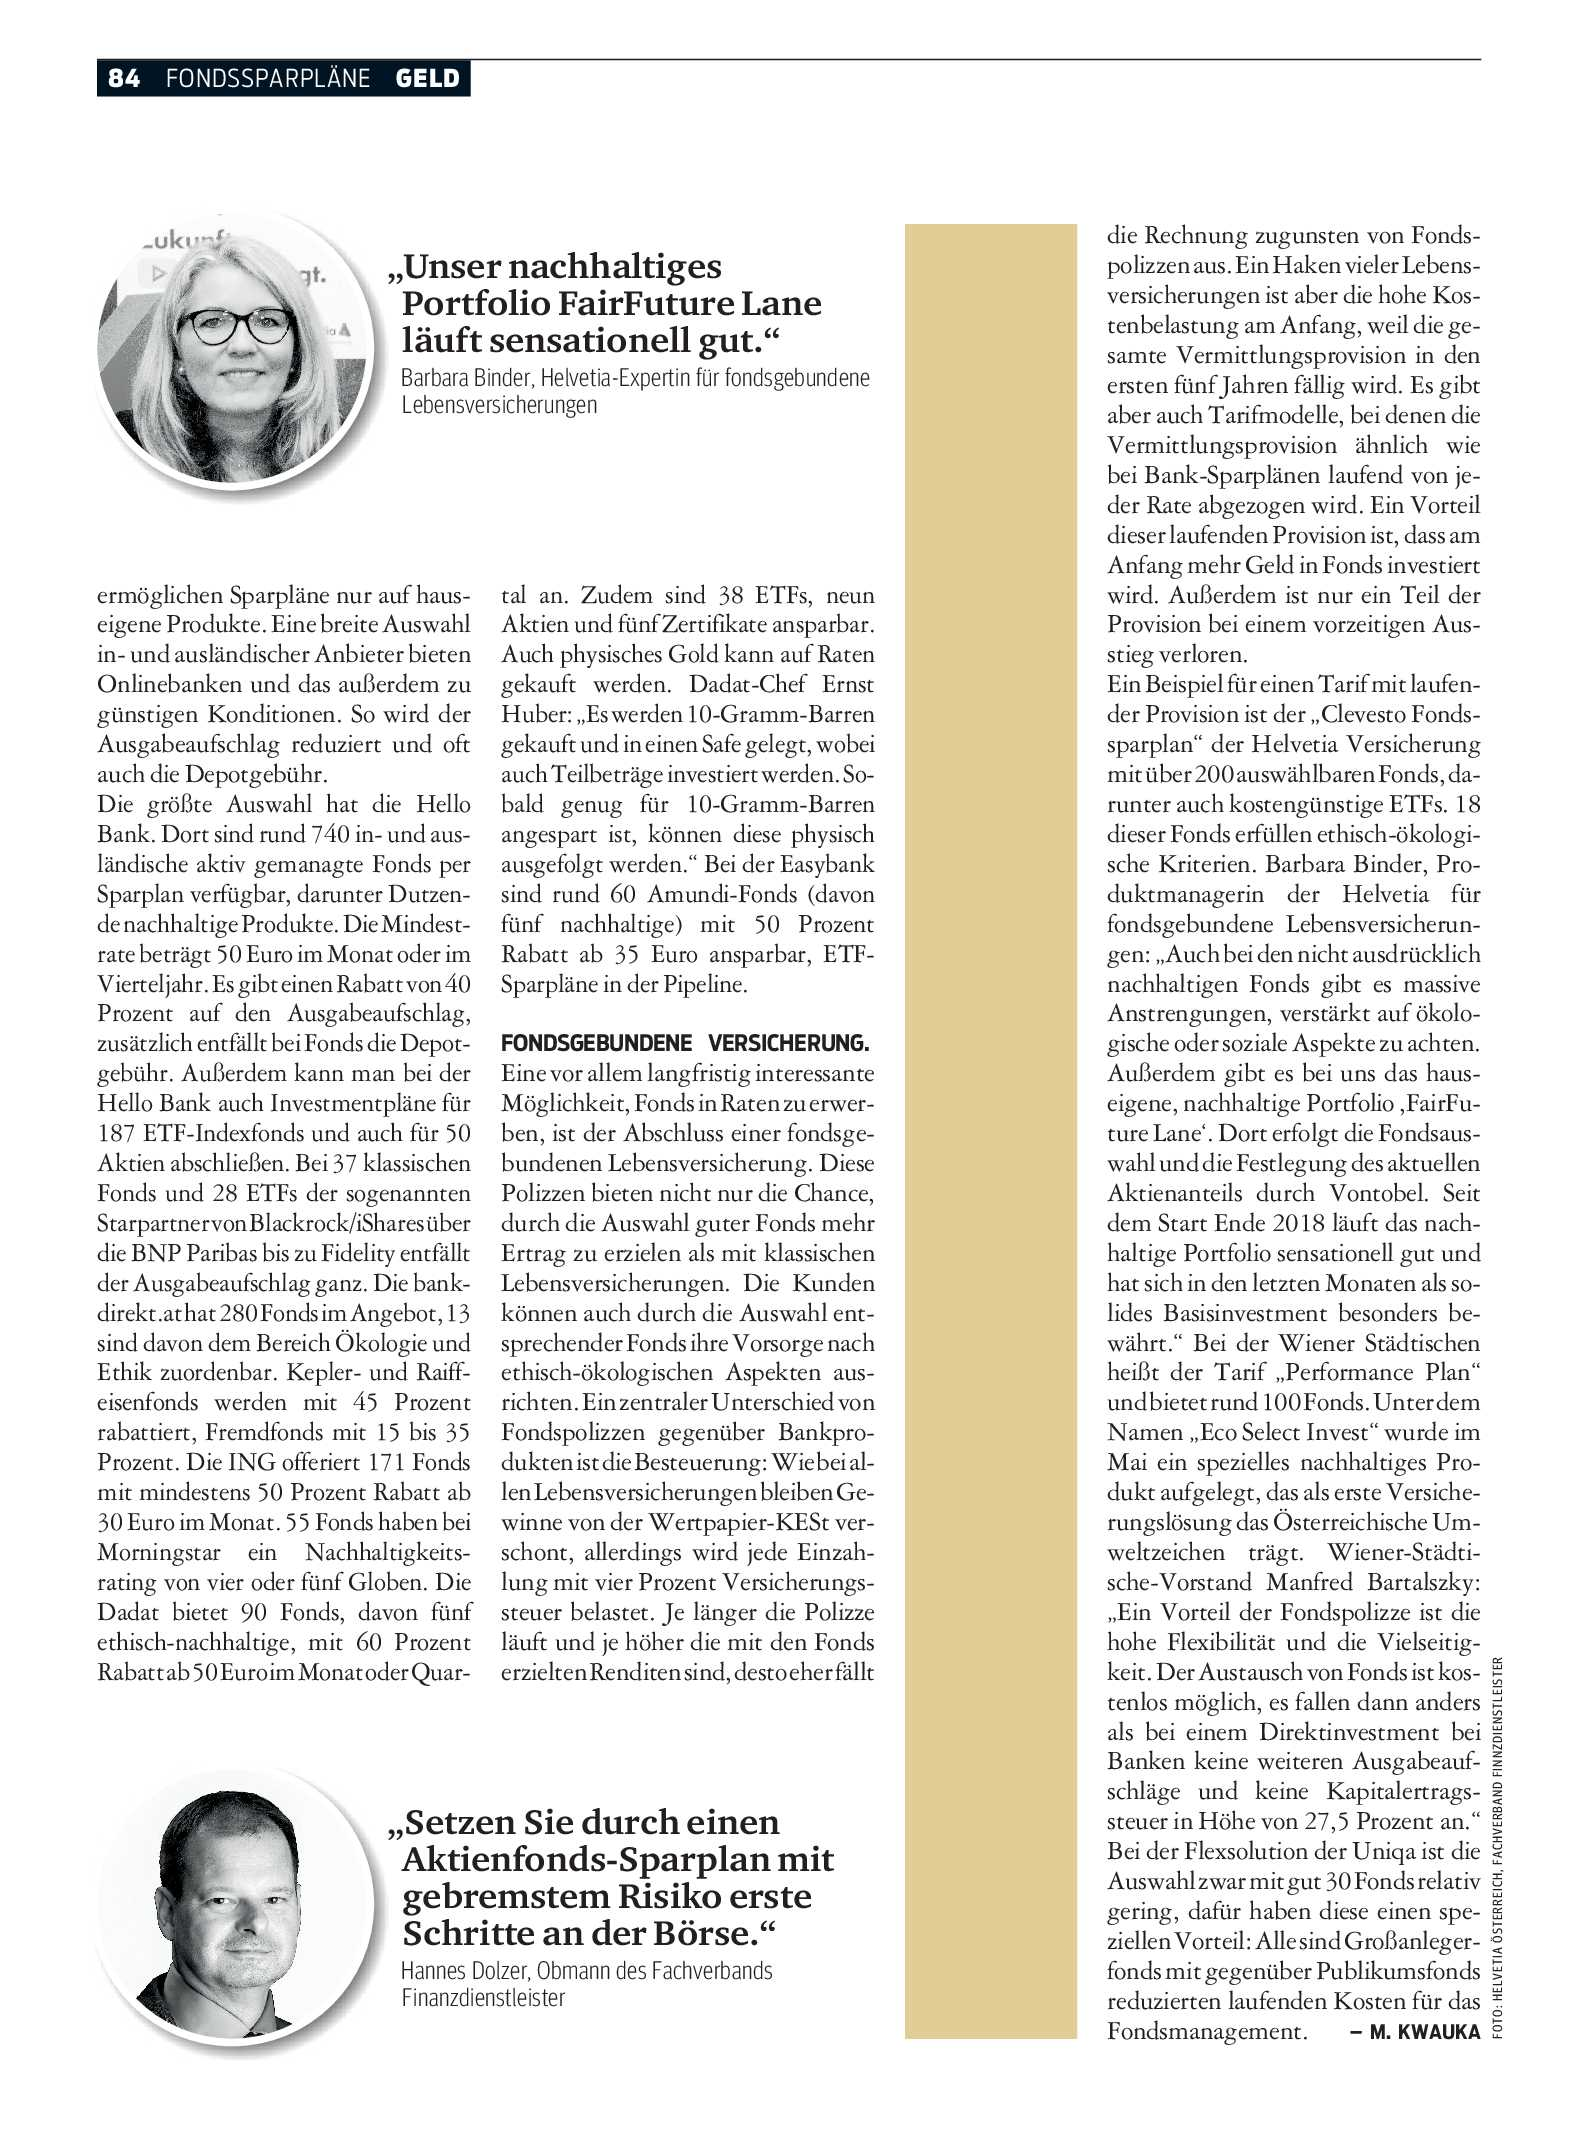 public/epaper/imported/20201118/kurier/magazin/magazin_20201118_084.jpg